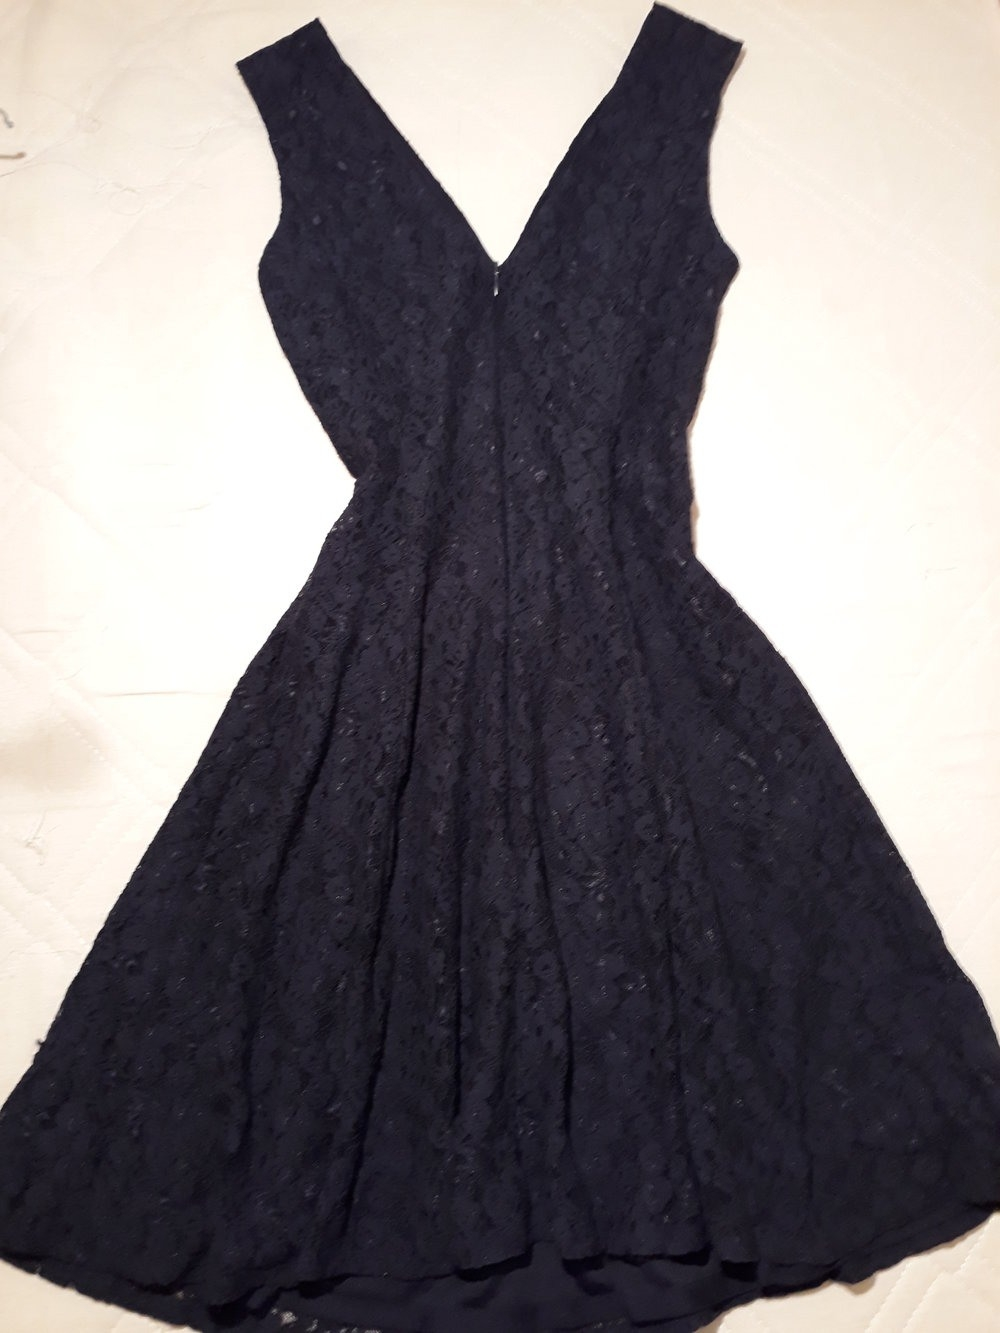 17 Coolste Dunkelblaues Kleid Spitze Bester Preis20 Perfekt Dunkelblaues Kleid Spitze Bester Preis